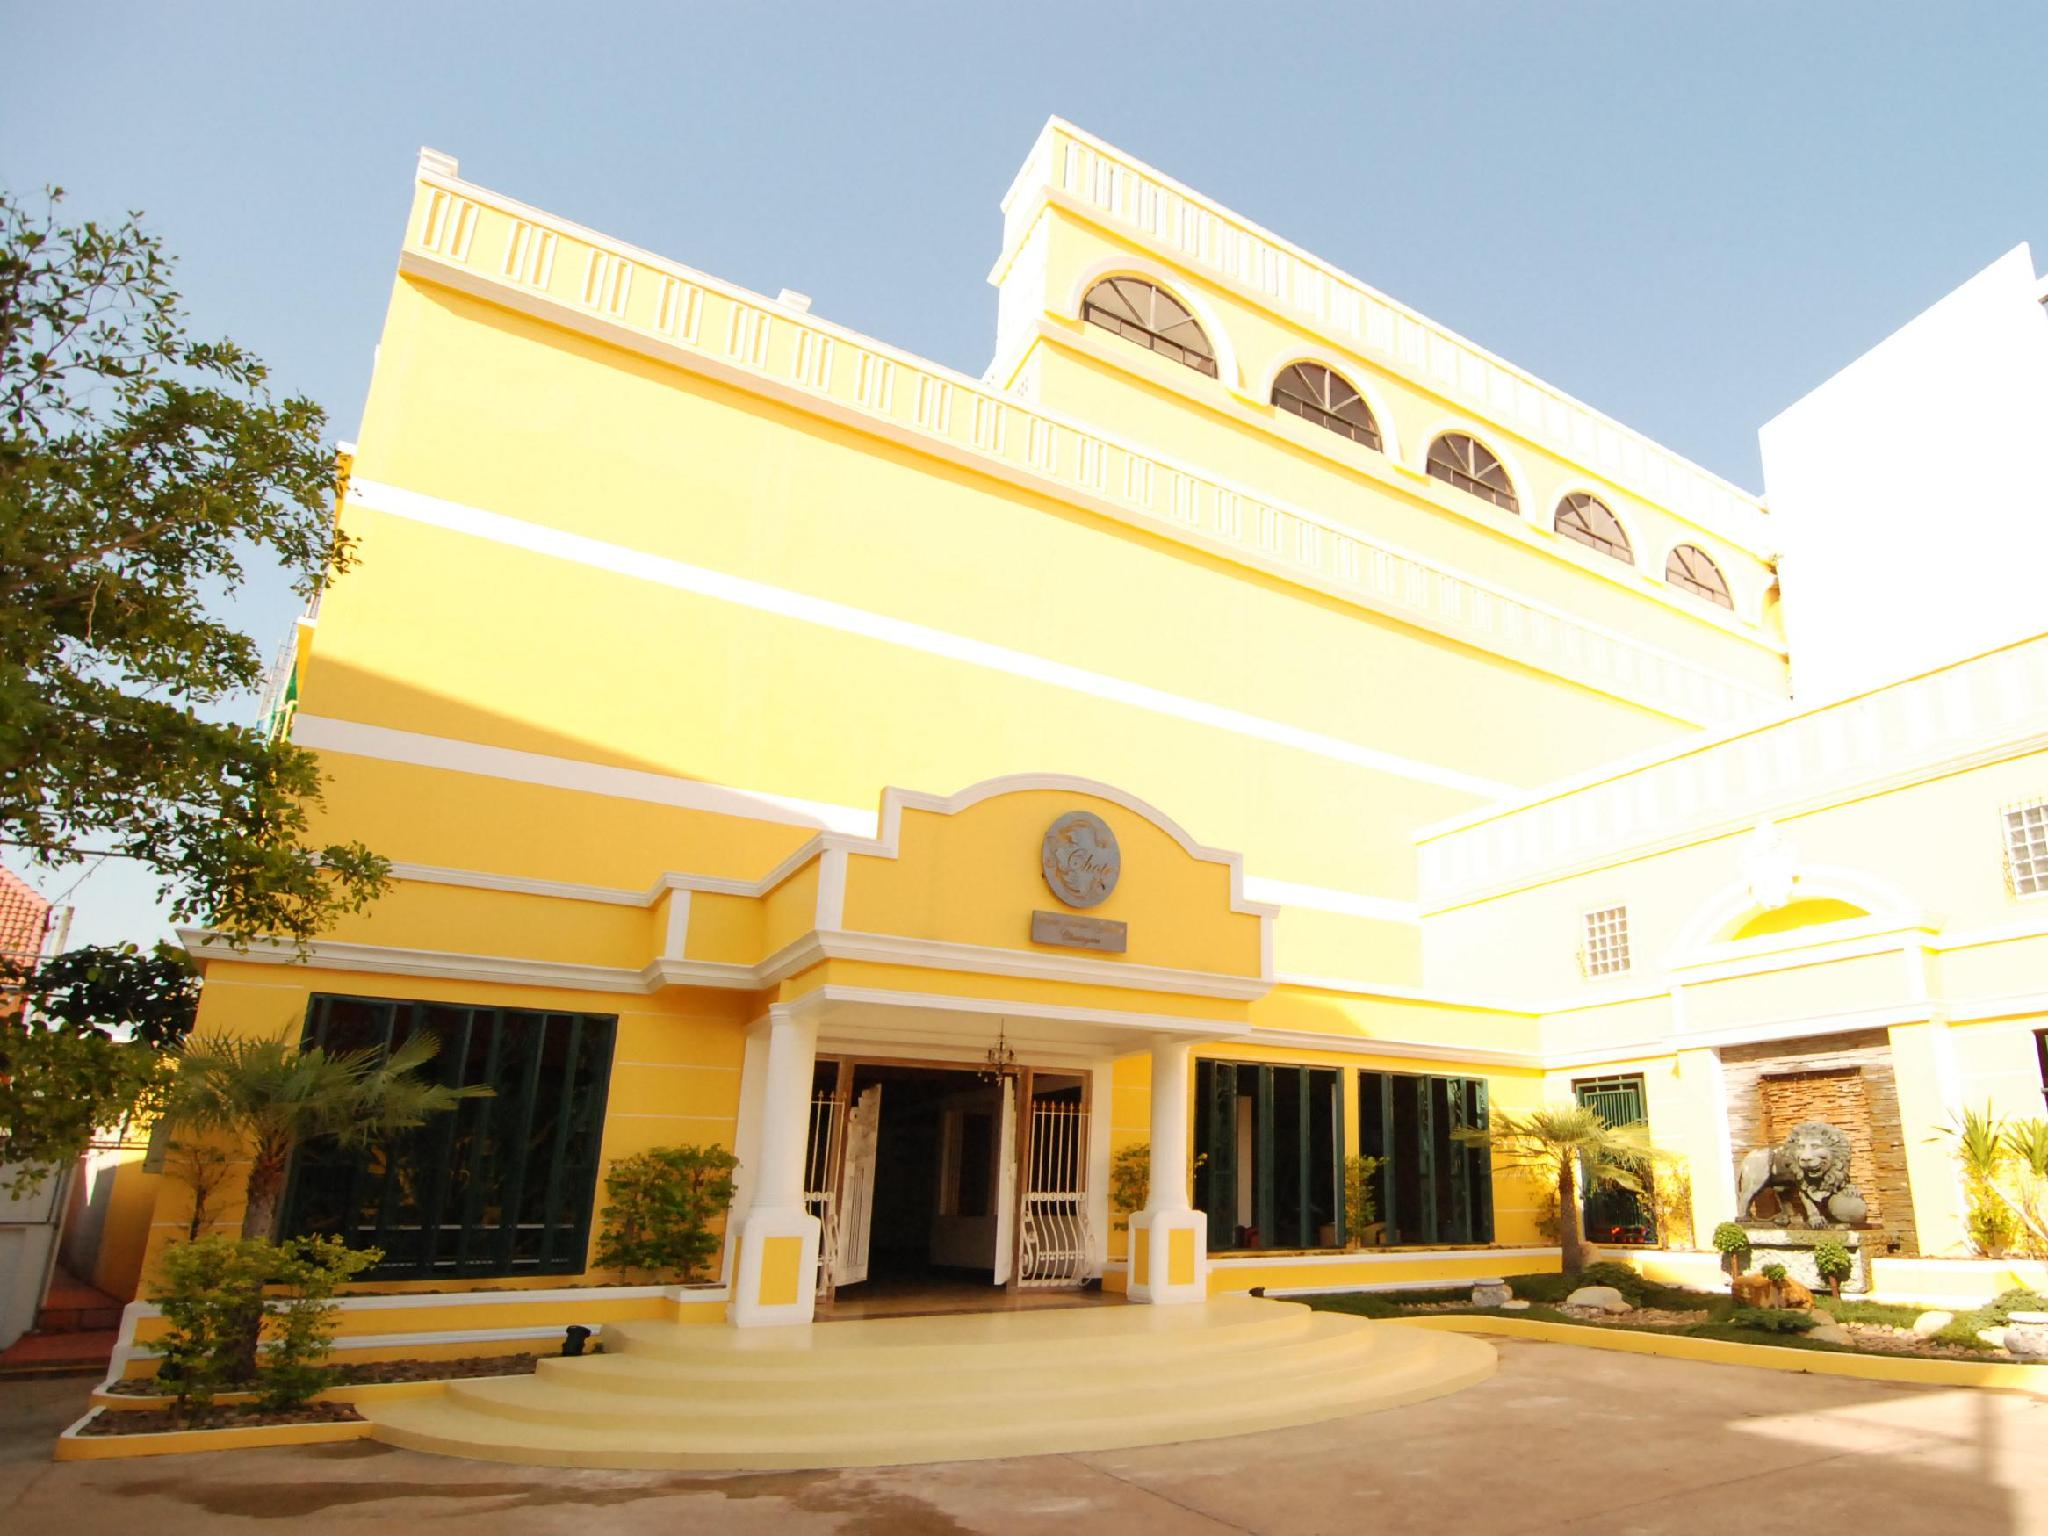 Chote' Home Gallery - Chiang Rai